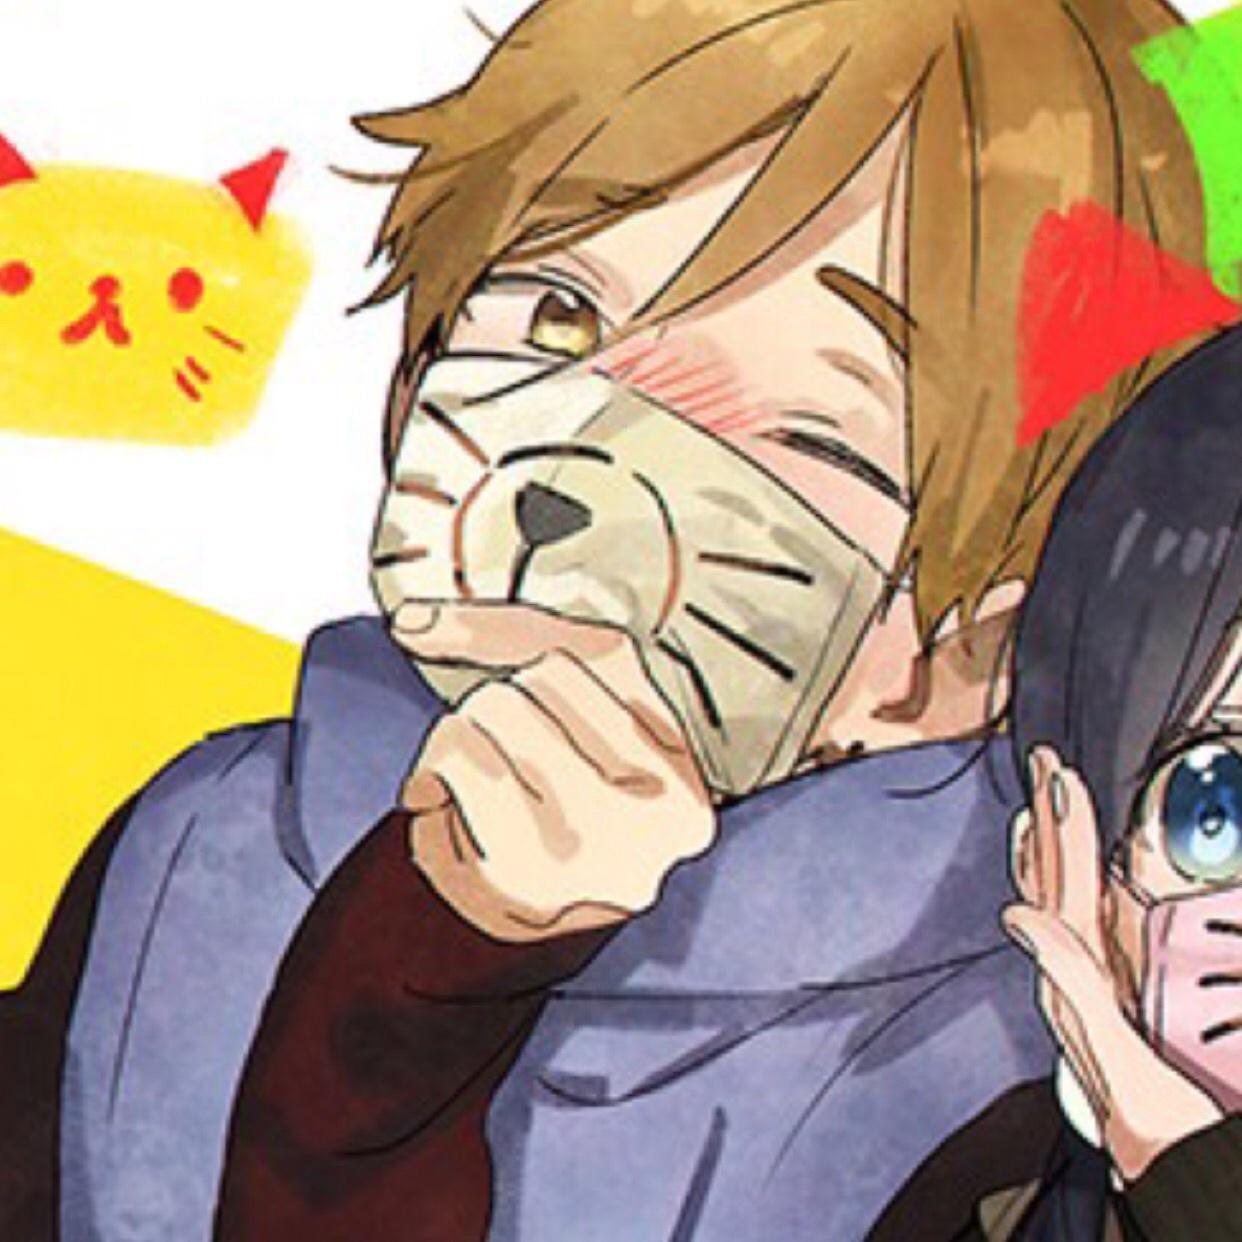 Cute Anime Couple Matching Pfp